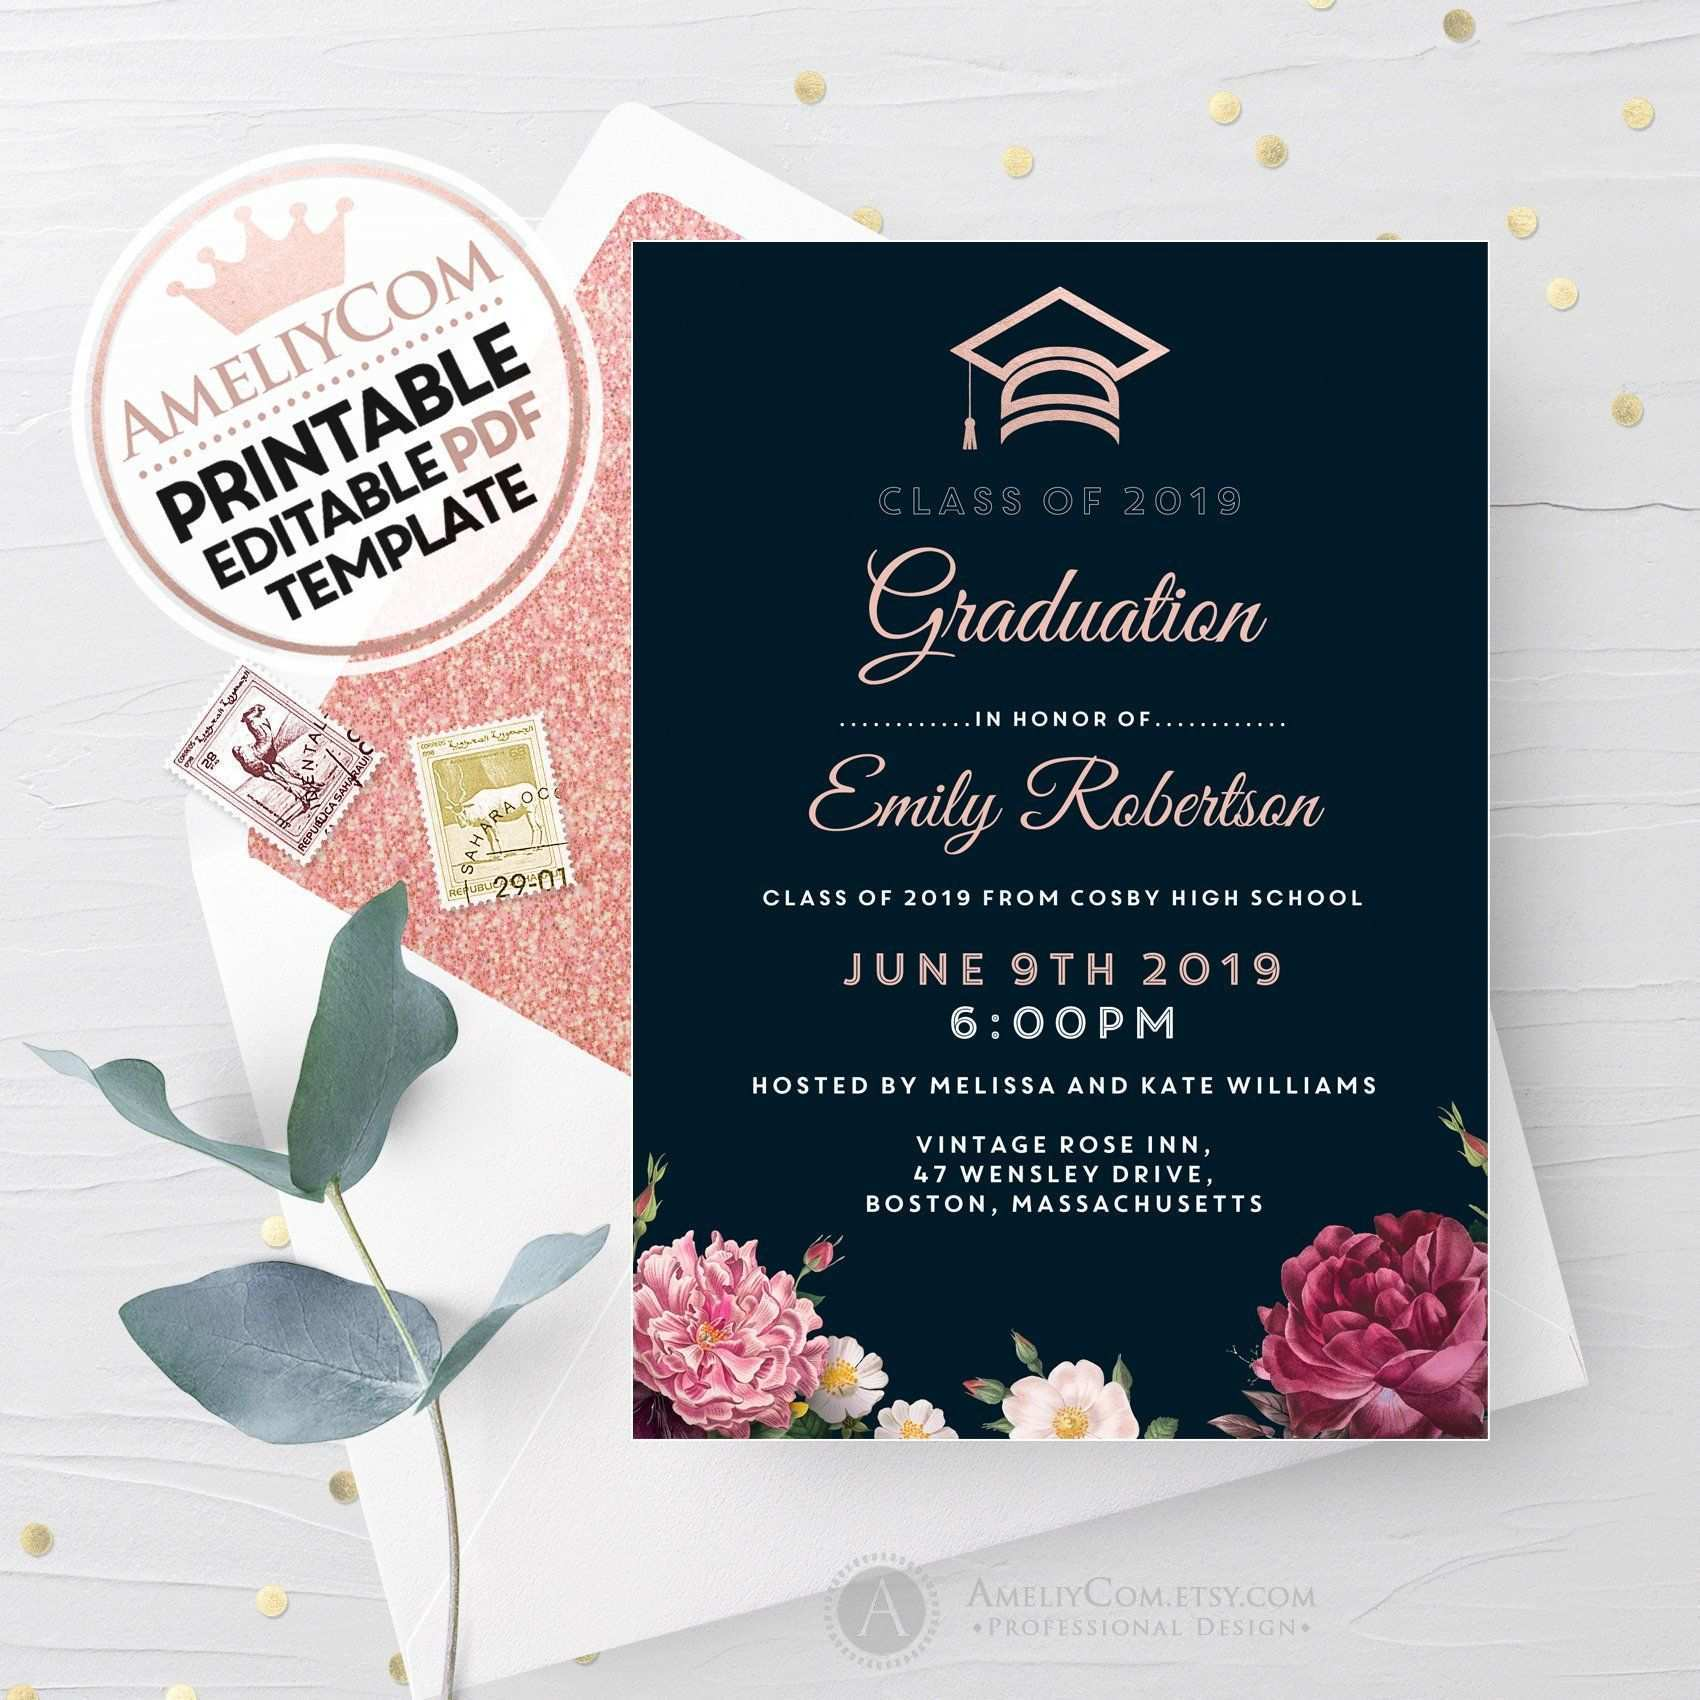 Black Graduation Invitation Printable Floral Announcement Invitation Template Girl College Einladungen Vorlagen Einladungsvorlage Einladungen